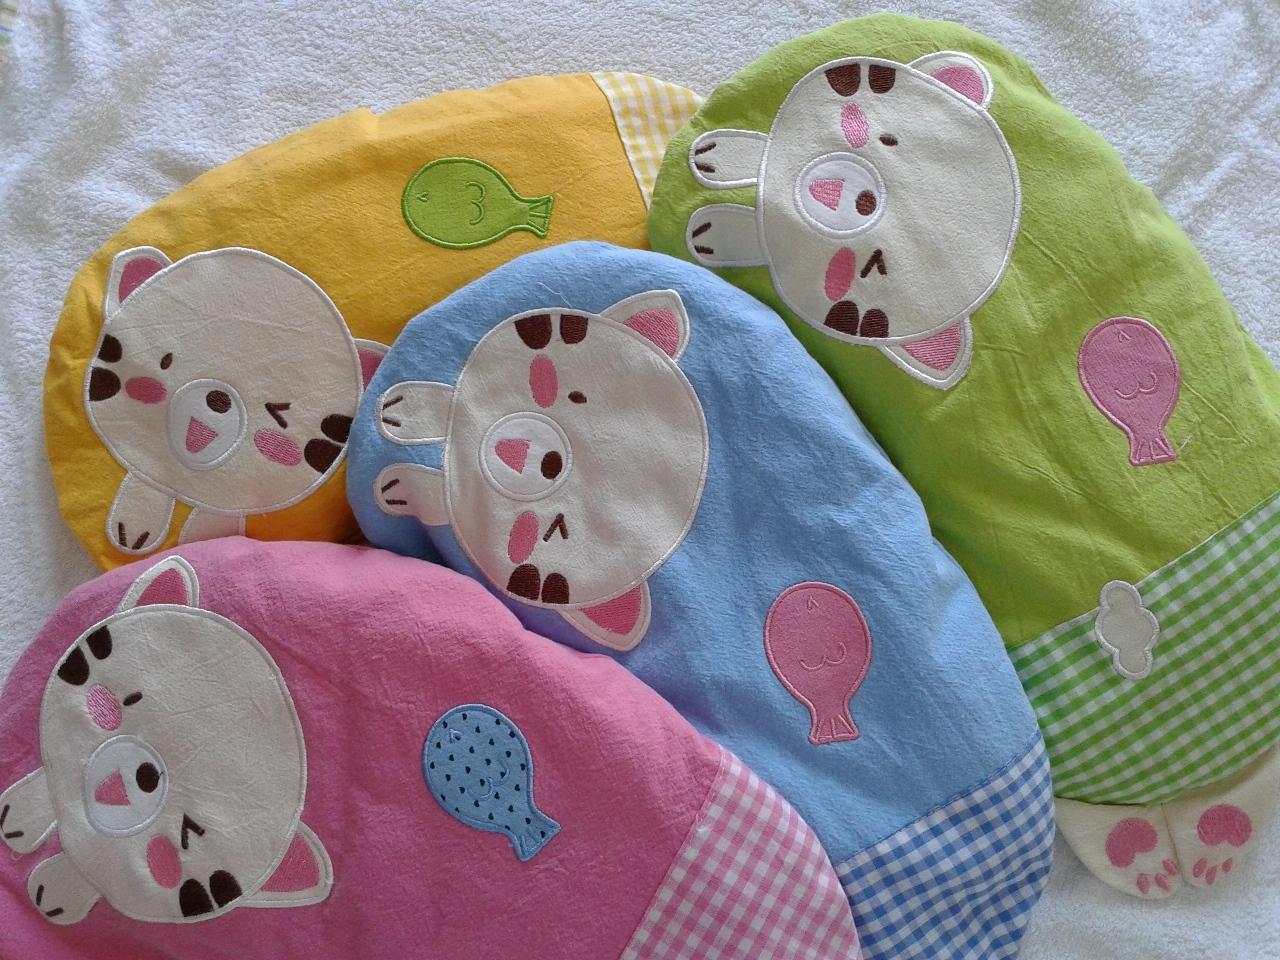 Buckwheat Pillow Benefits | Husk Pillow | Buckwheat Hull